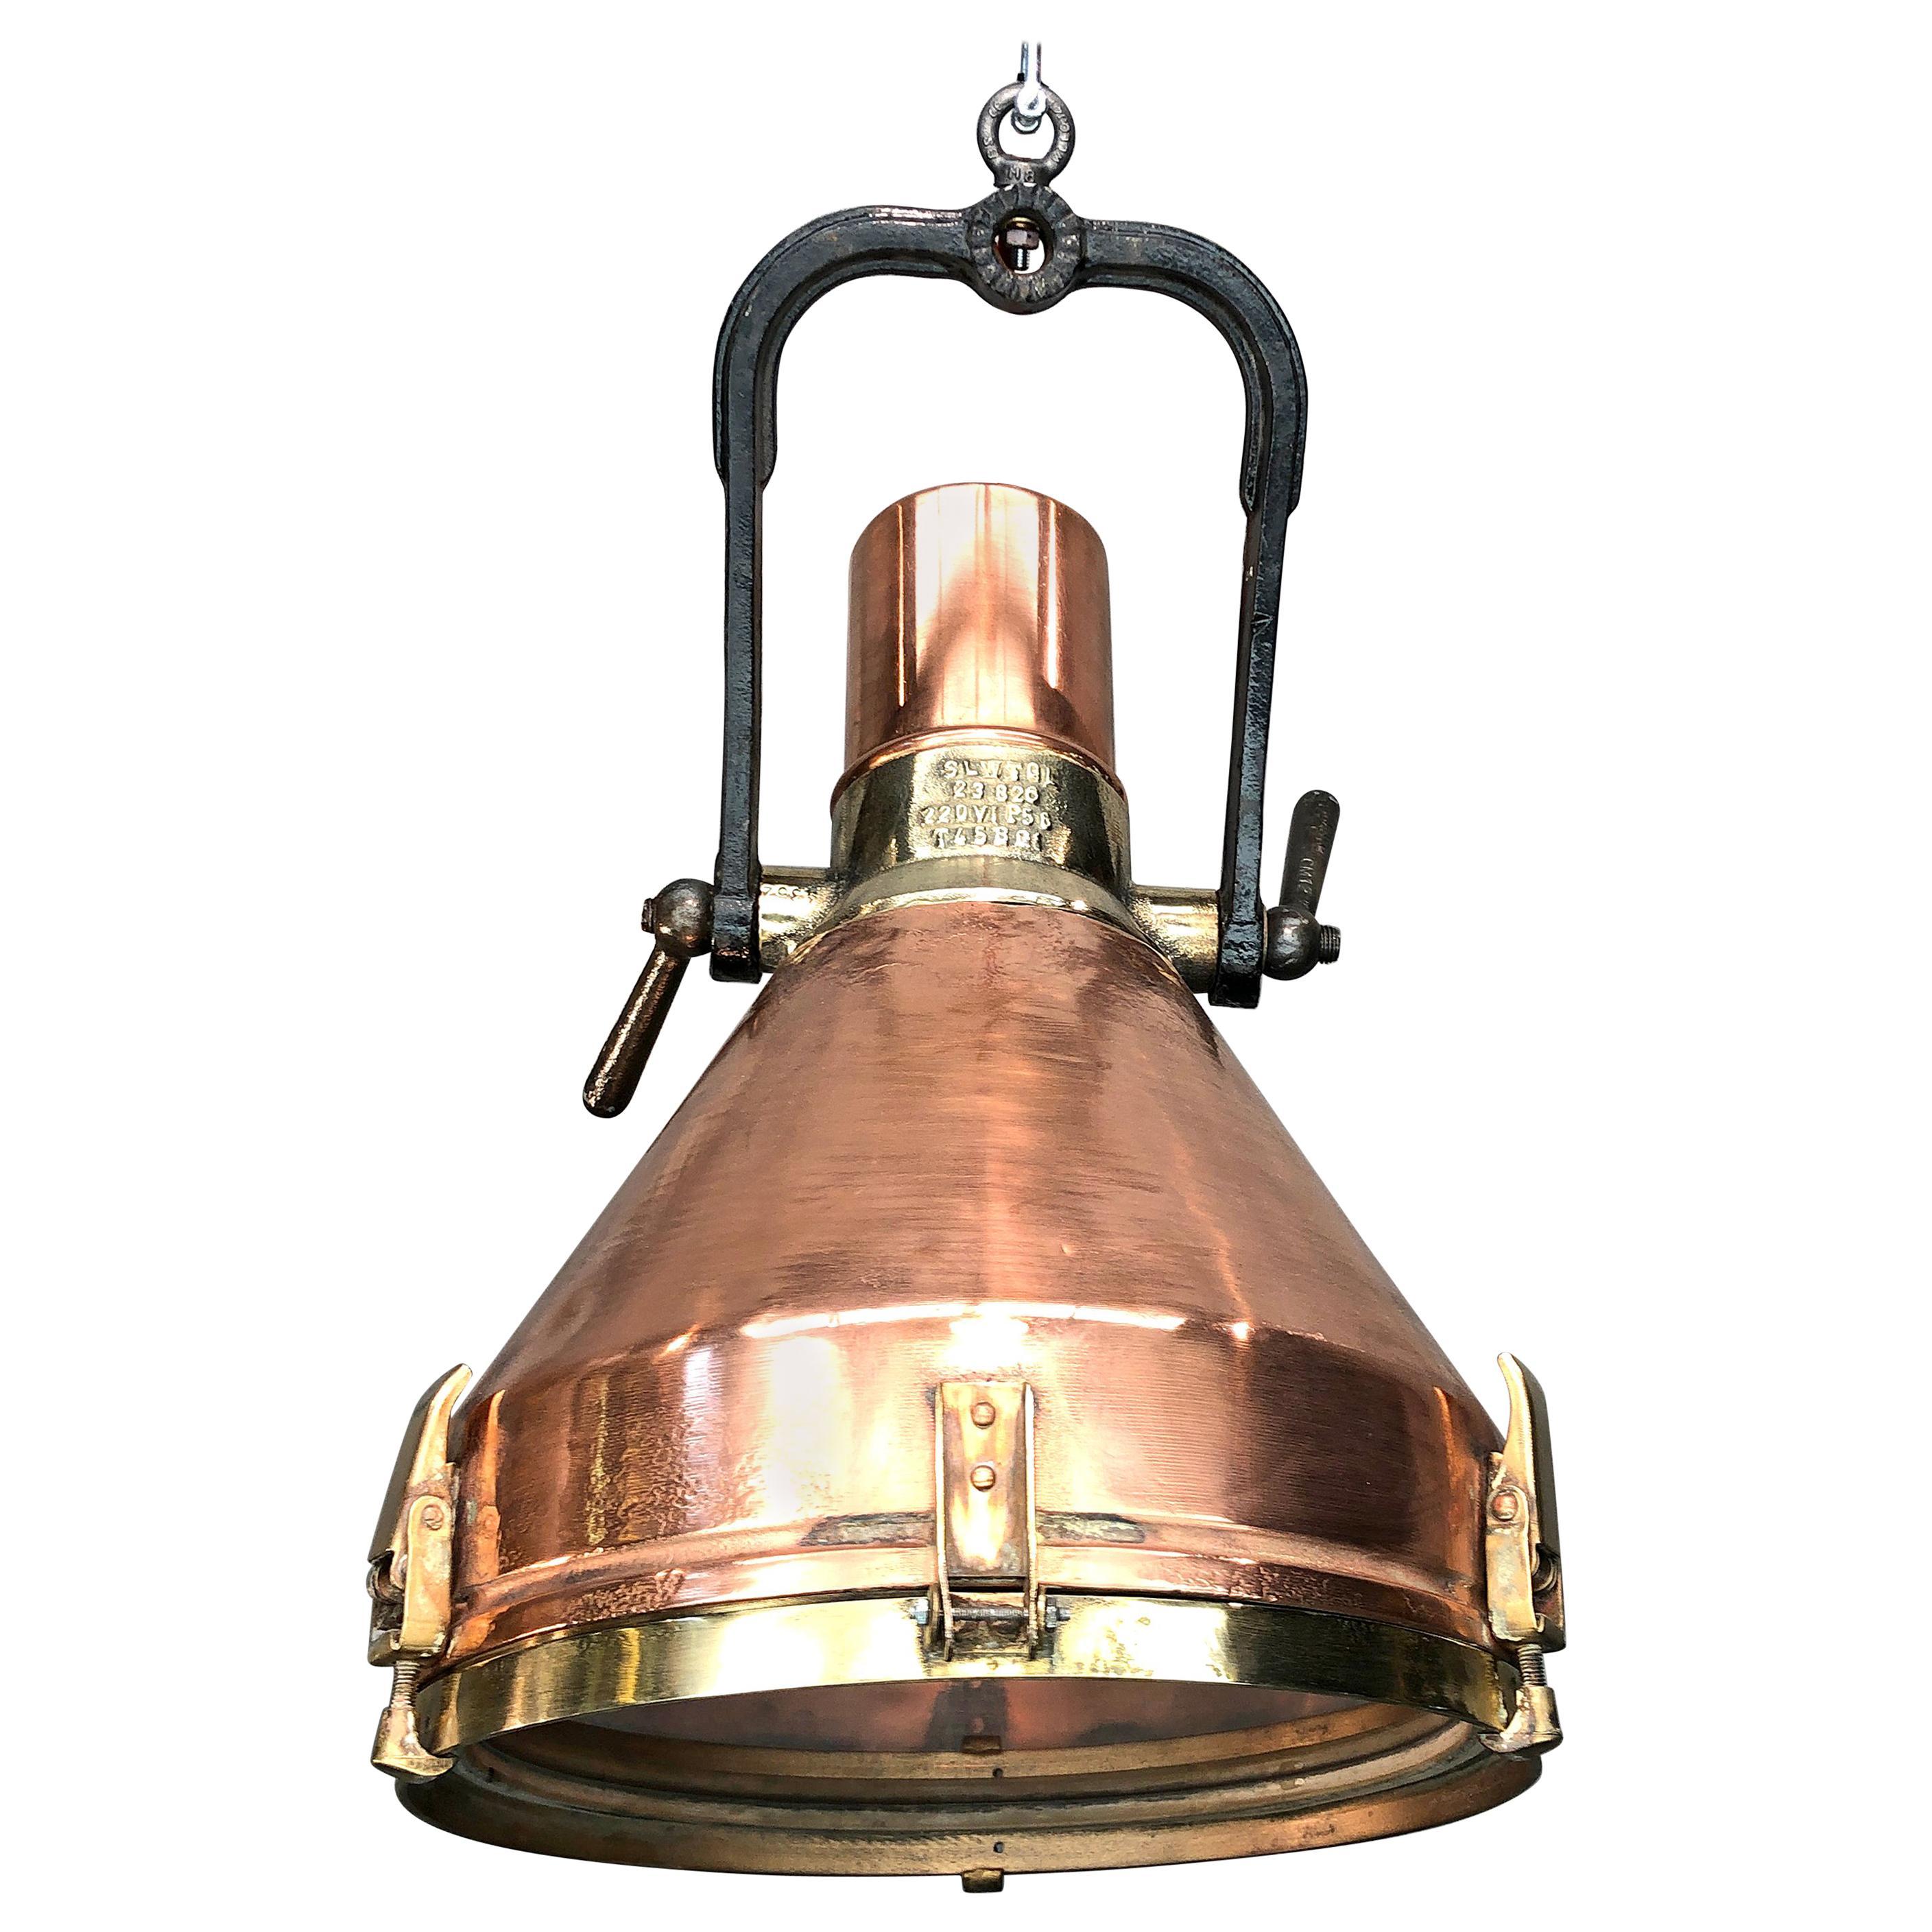 Midcentury Industrial German VEB Copper, Cast Brass, Iron and Glass Pendant Lamp